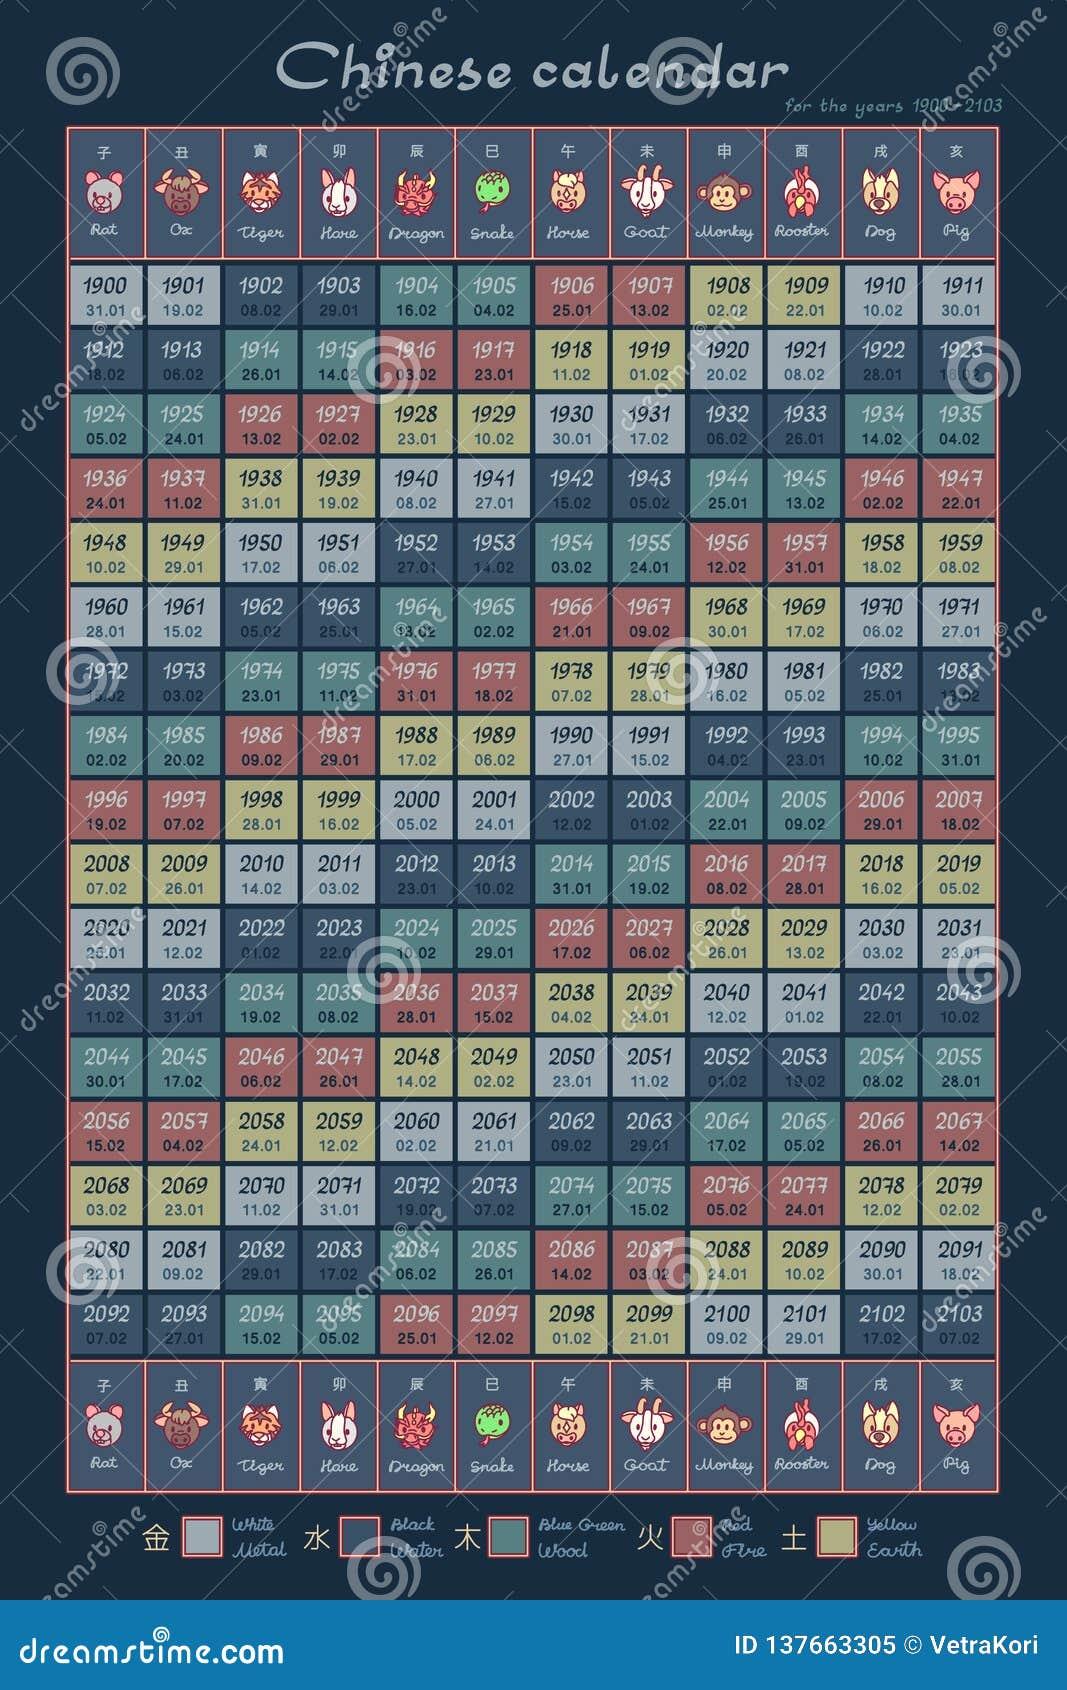 Calendario Chino.Calendario Chino De La Astrologia Del Vector Ilustracion Del